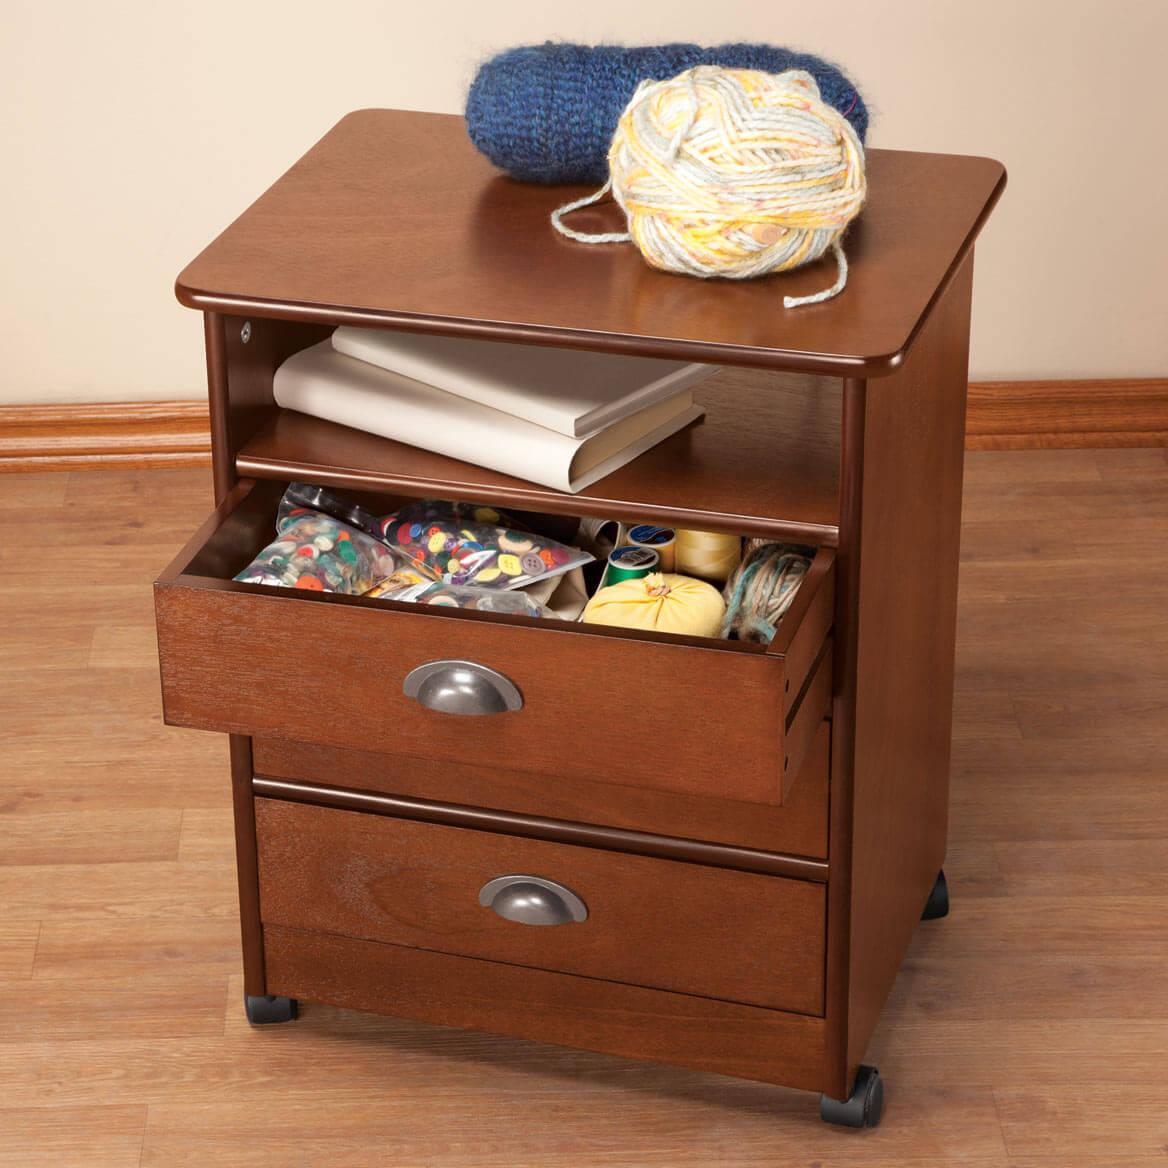 Three Drawer Multipurpose Rolling Cart by OakRidge™-359628